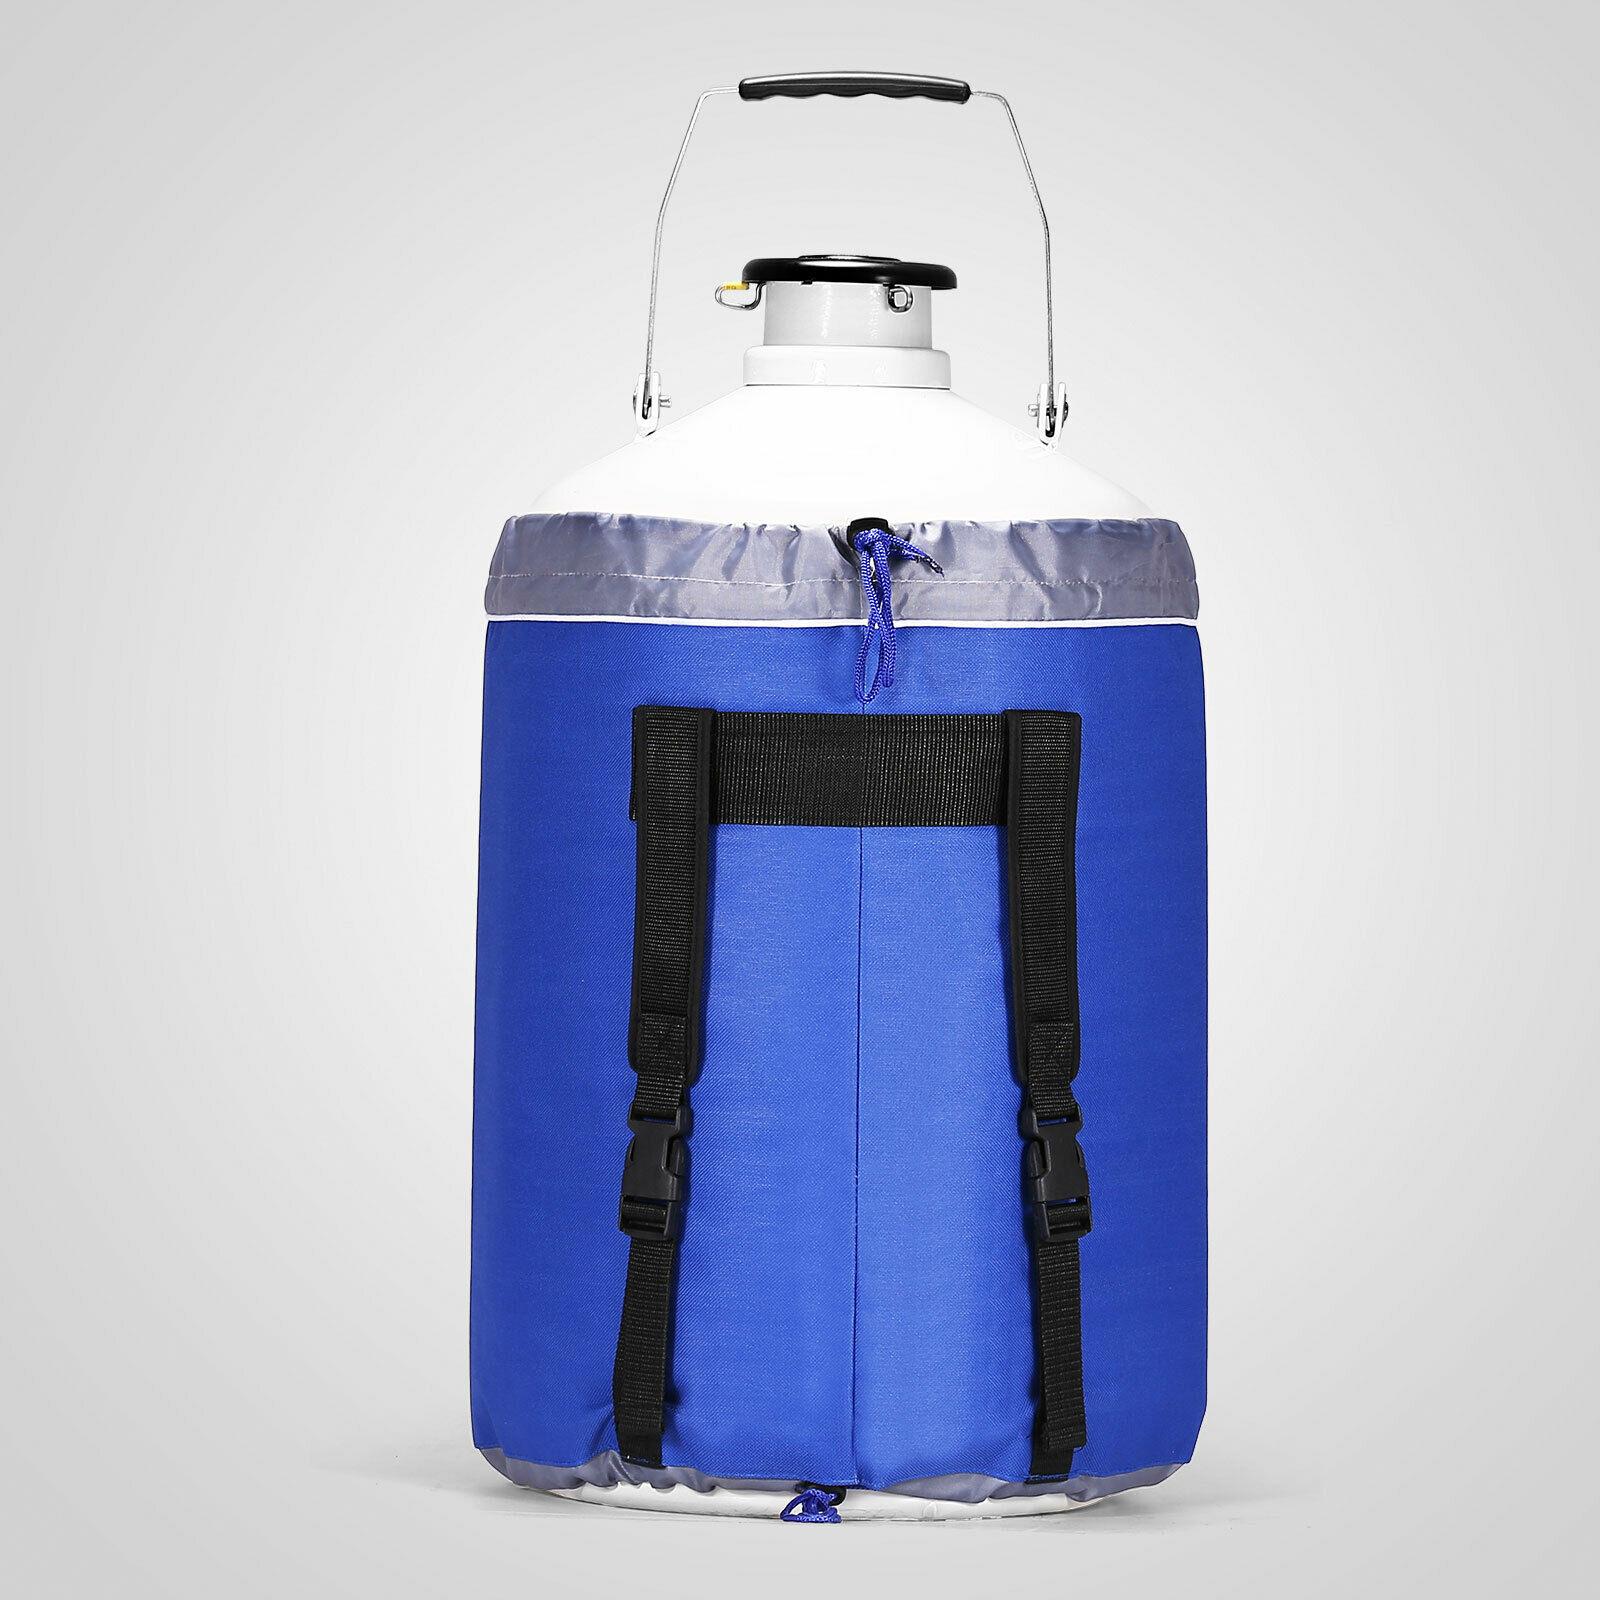 Tanque de nitrogênio líquido ln2 garrafa tanque recipiente freeze dewar cryogenics 10l